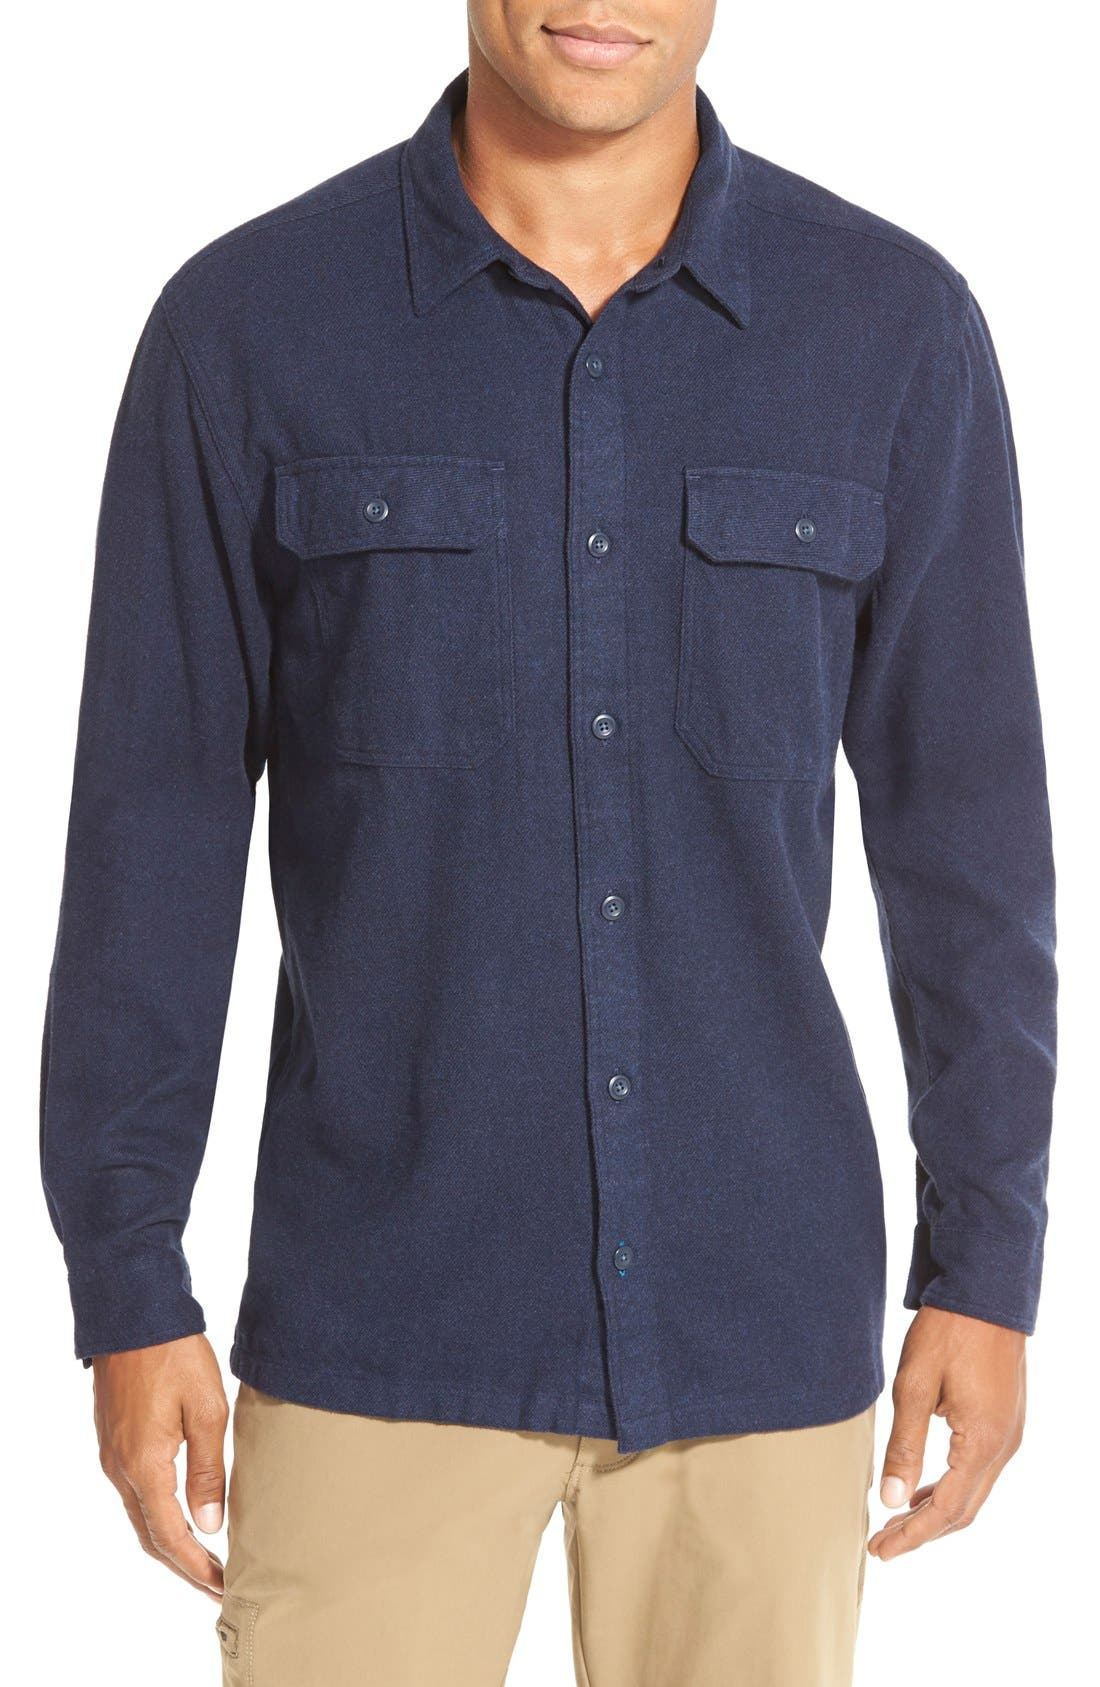 'Fjord' Regular Fit Organic Cotton Flannel Shirt,                             Main thumbnail 1, color,                             Migration Plaid: Andes Blue